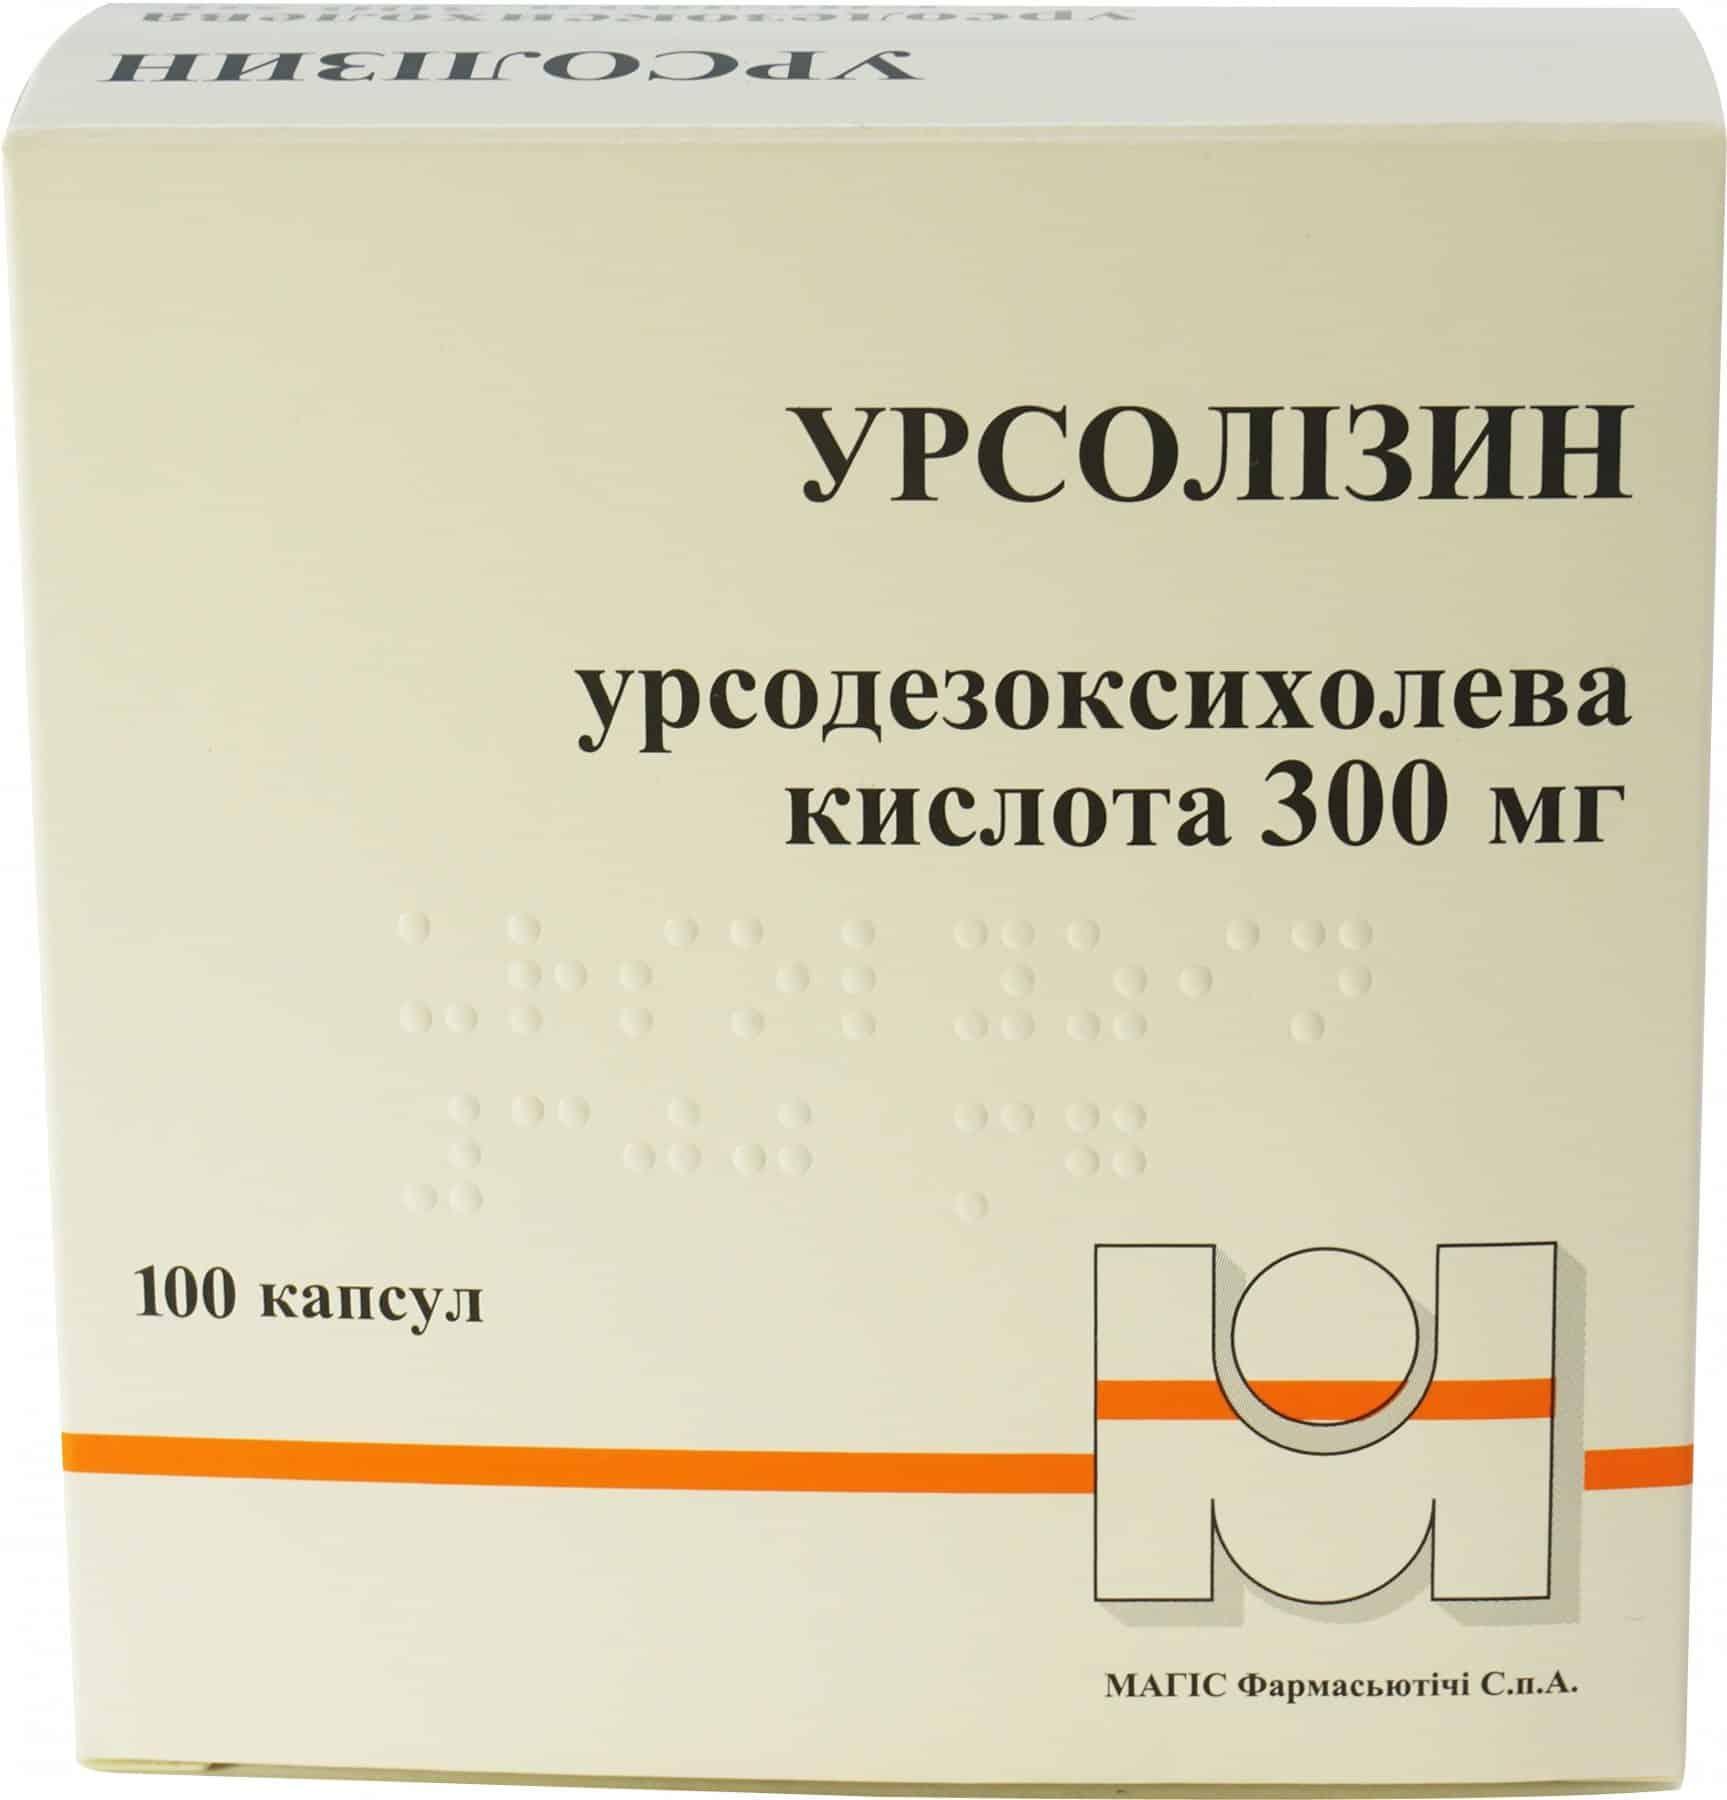 Ursolizin (ursodeoxycholic acid) capsules 300 mg. №100